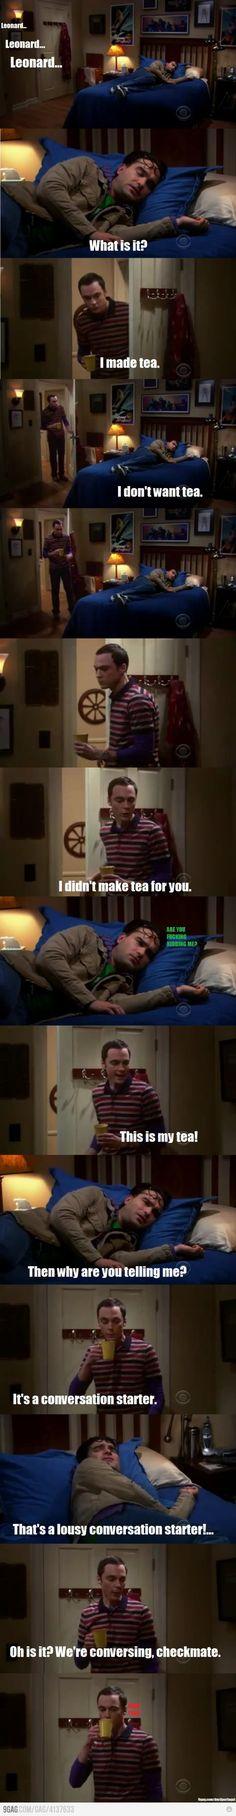 Sheldon Cooper being Sheldon Cooper.